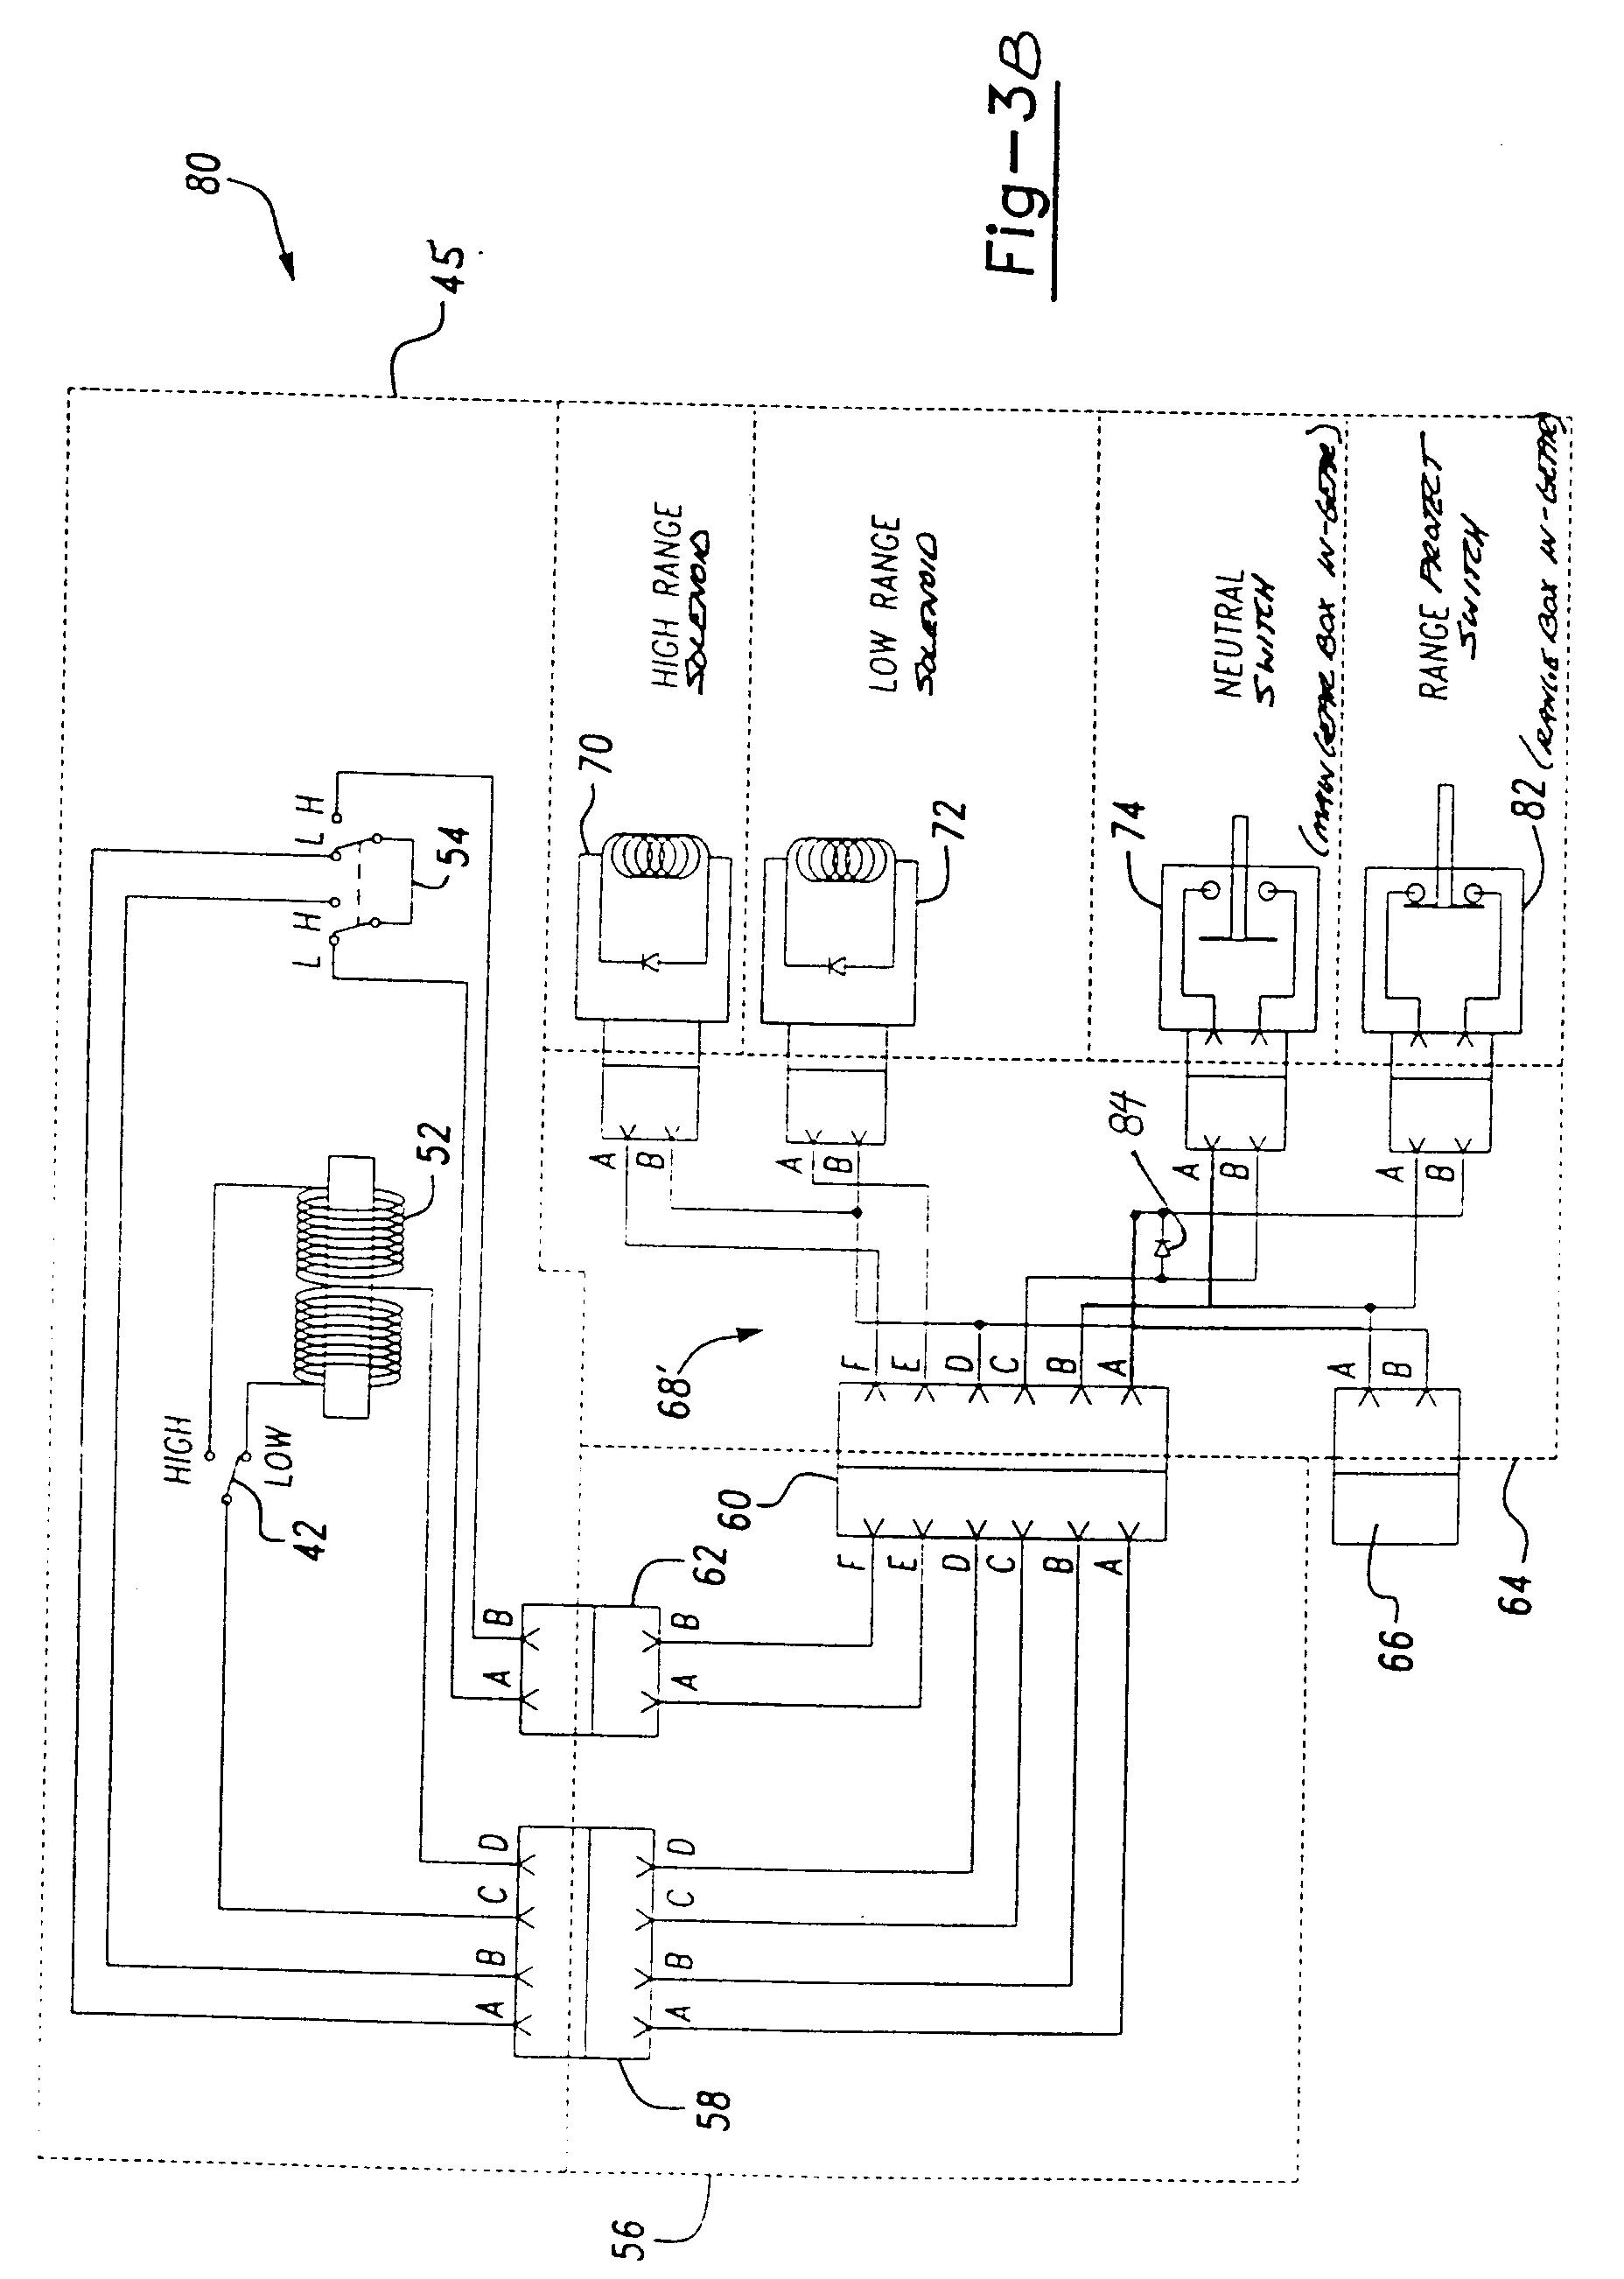 Meritor Abs Wiring Trusted Diagram Wabco Smart Diagrams U2022 Trailer